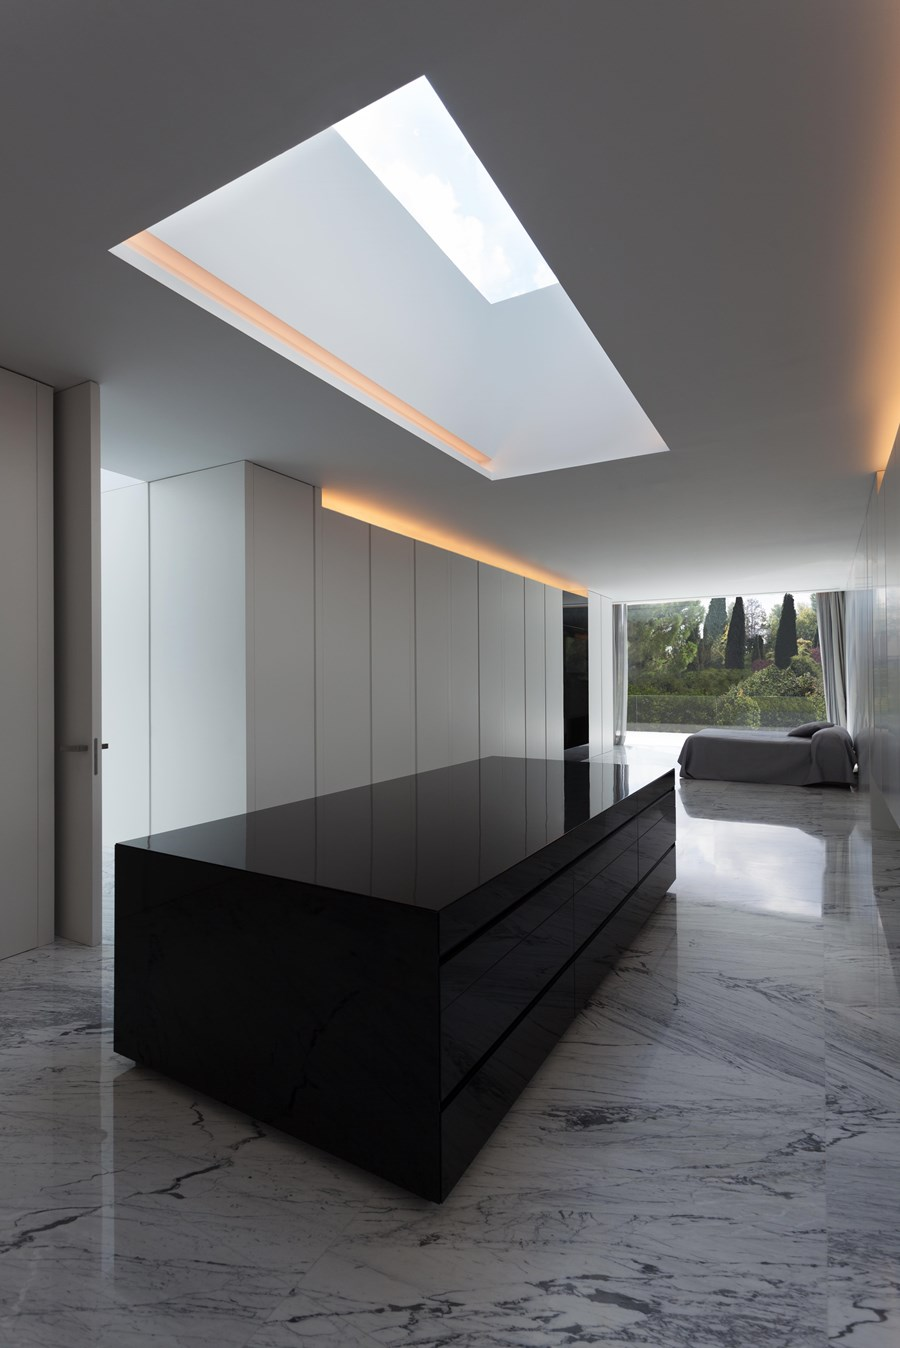 Aluminium House by Fran Silvestre Arquitectos 15